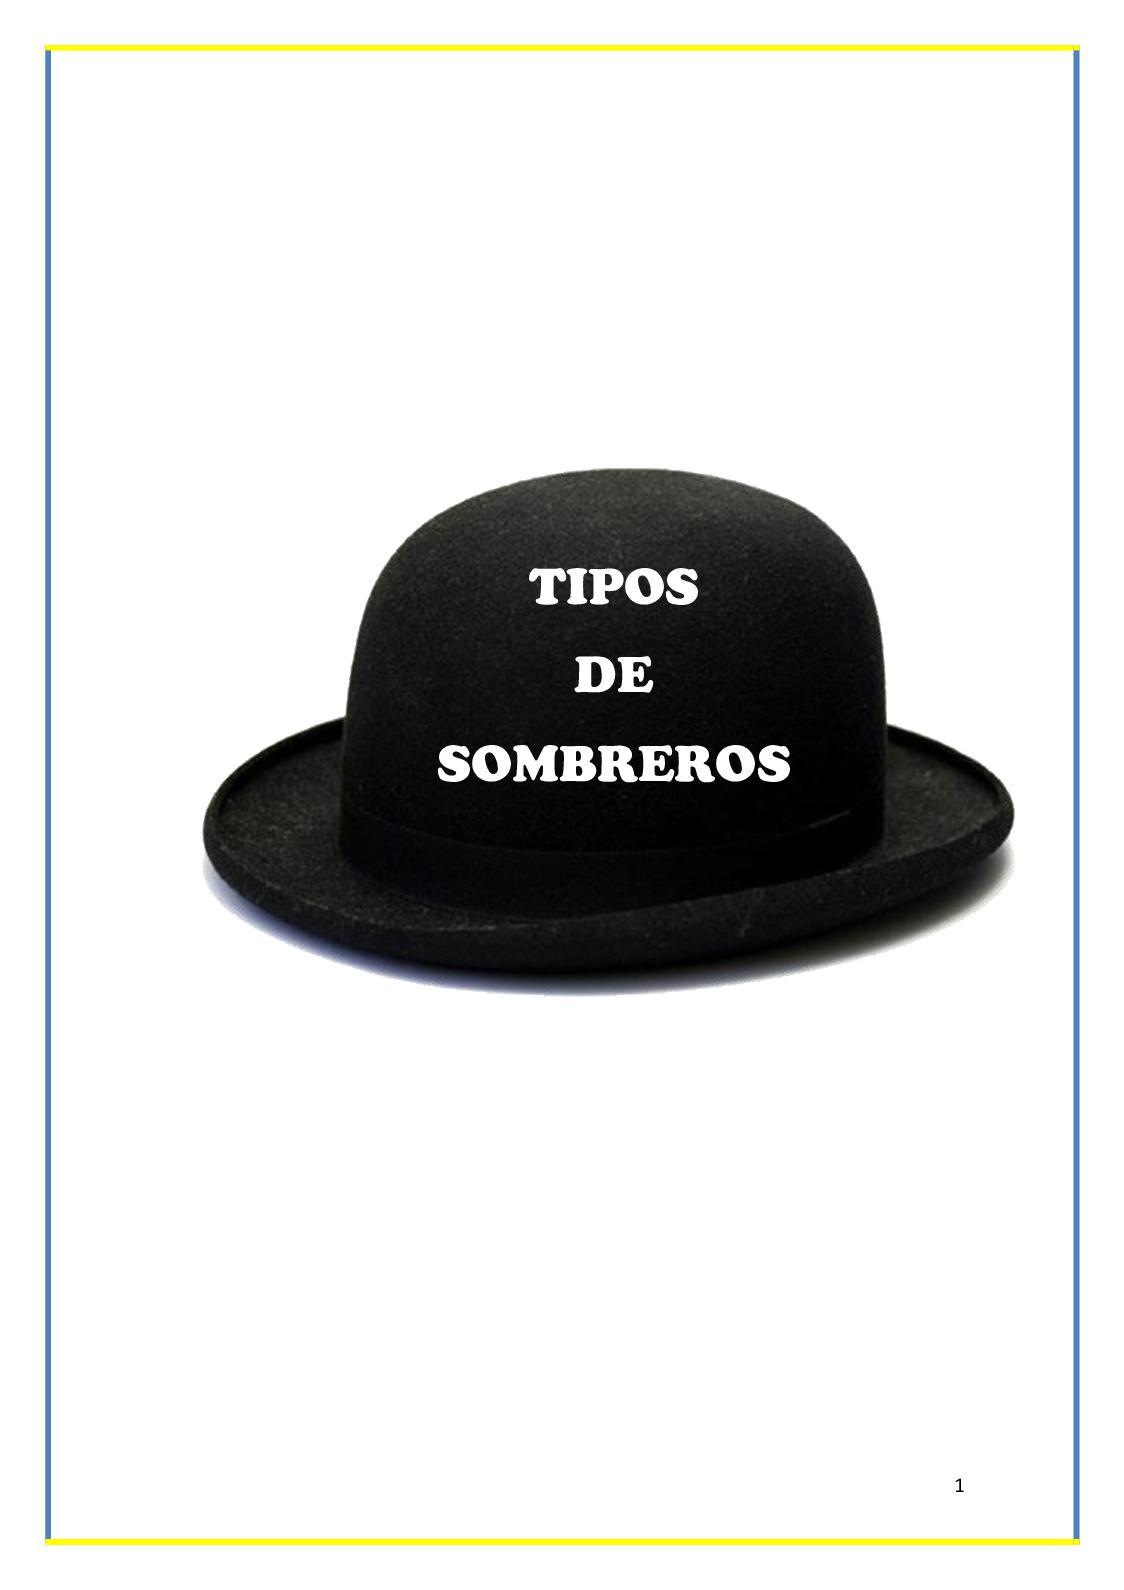 Scippis Paxton Sombrero Fedora Sombrero Occidental Sombrero de Lluvia Sombrero al Aire Libre Sombrero de Lana Sombrero de Fieltro